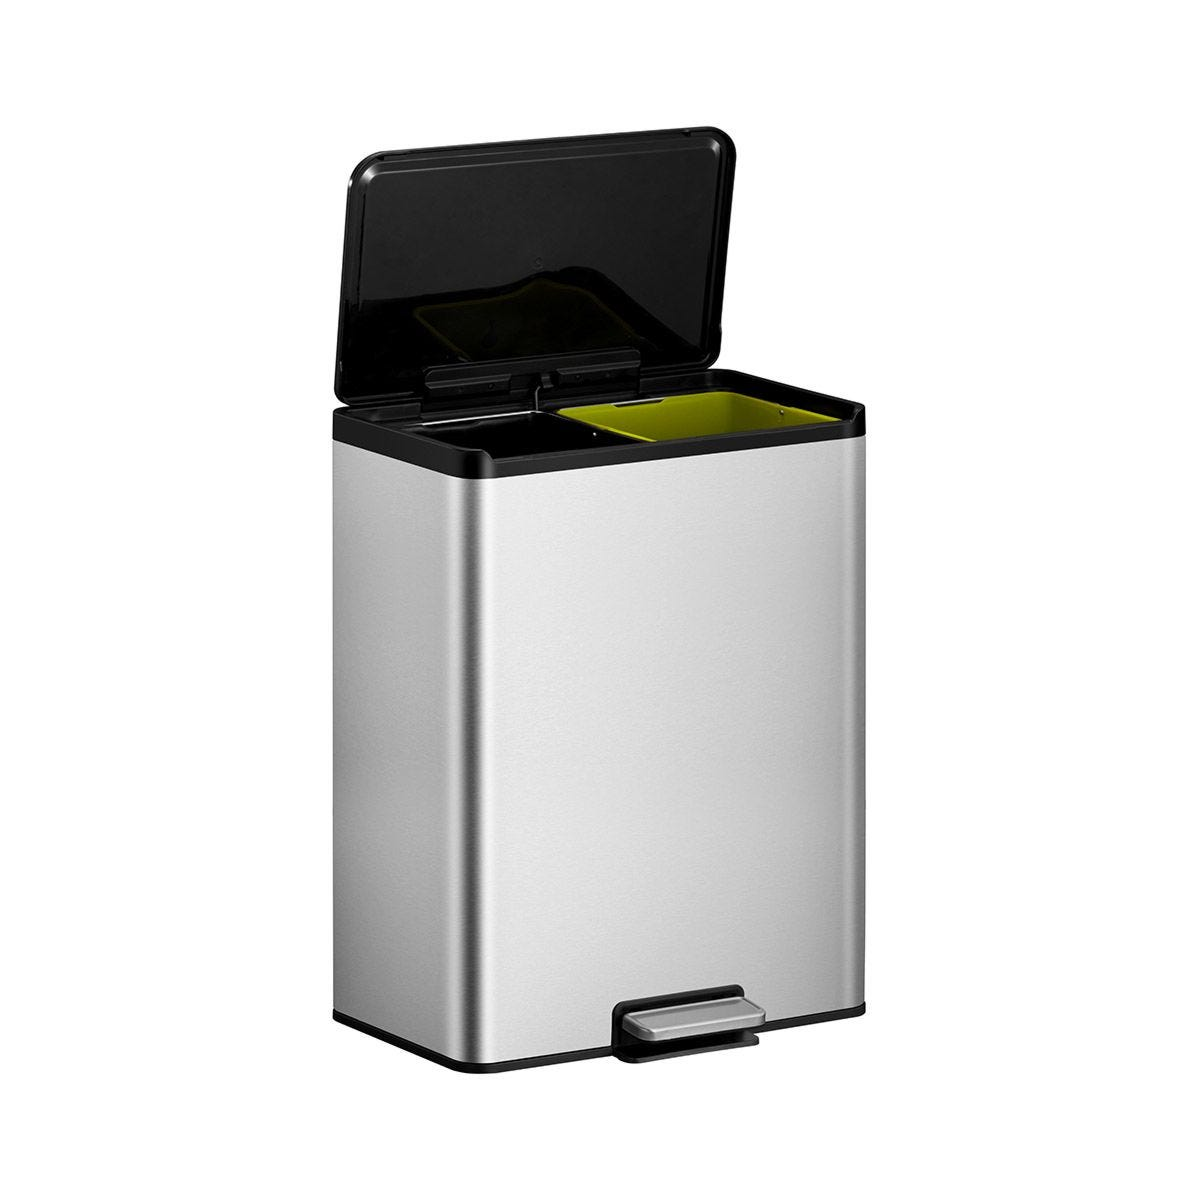 EKO Essential Recycler Bin 20+20L